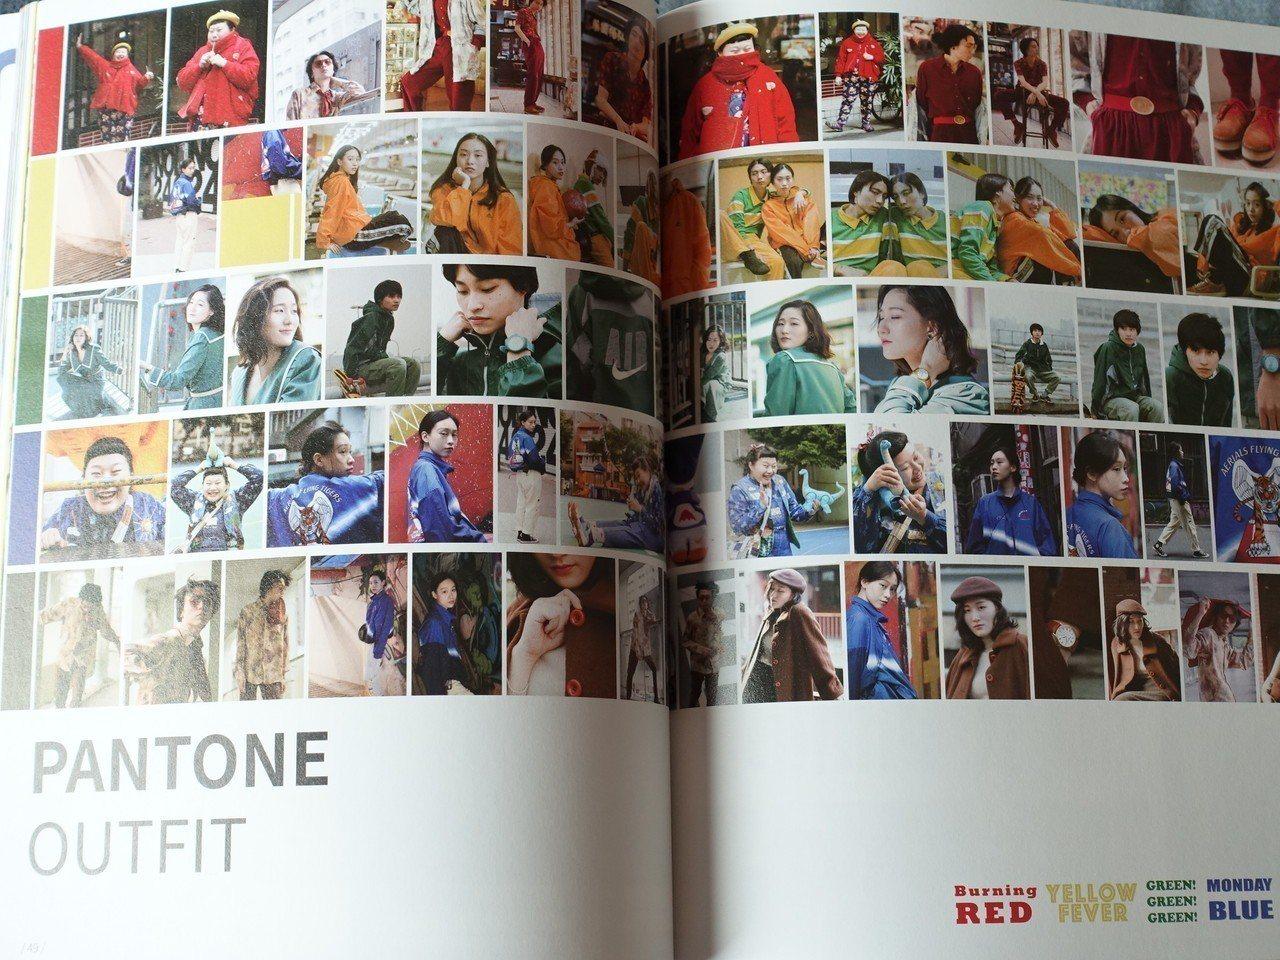 「unFitter」雜誌,從採寫、拍照到編輯完全由吳曉雯、楊子緯、陳靖雯三人自己...